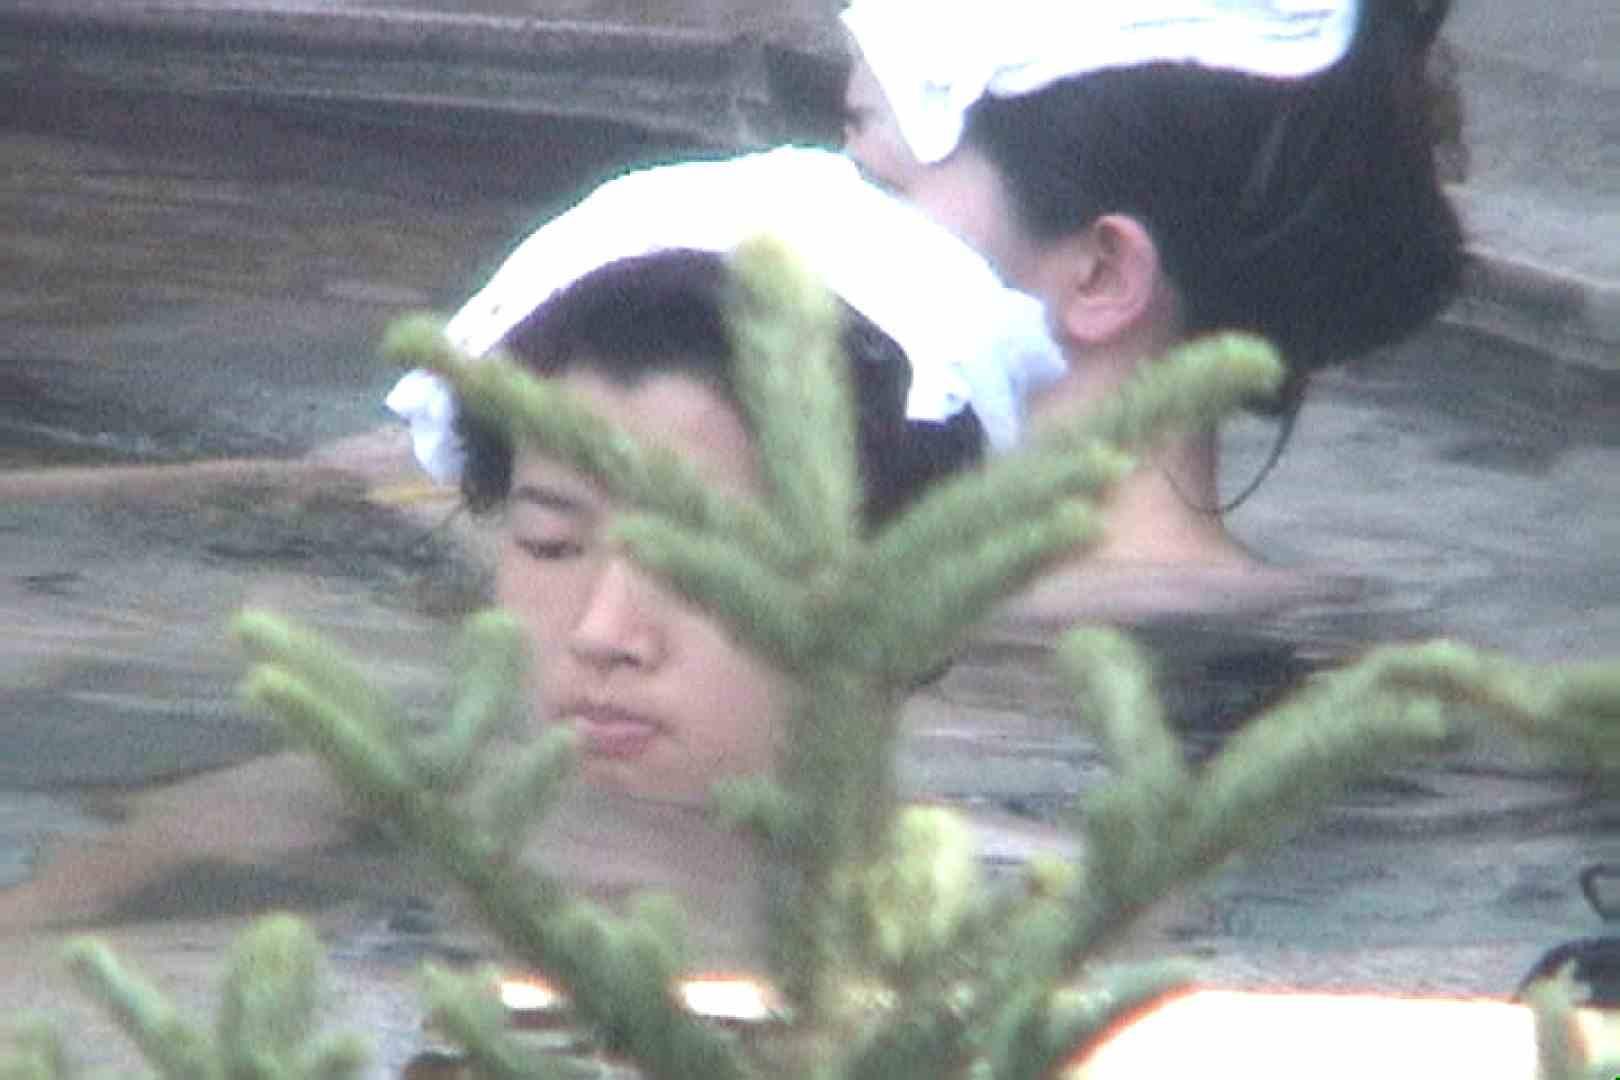 Aquaな露天風呂Vol.80【VIP限定】 露天風呂編  76PIX 42